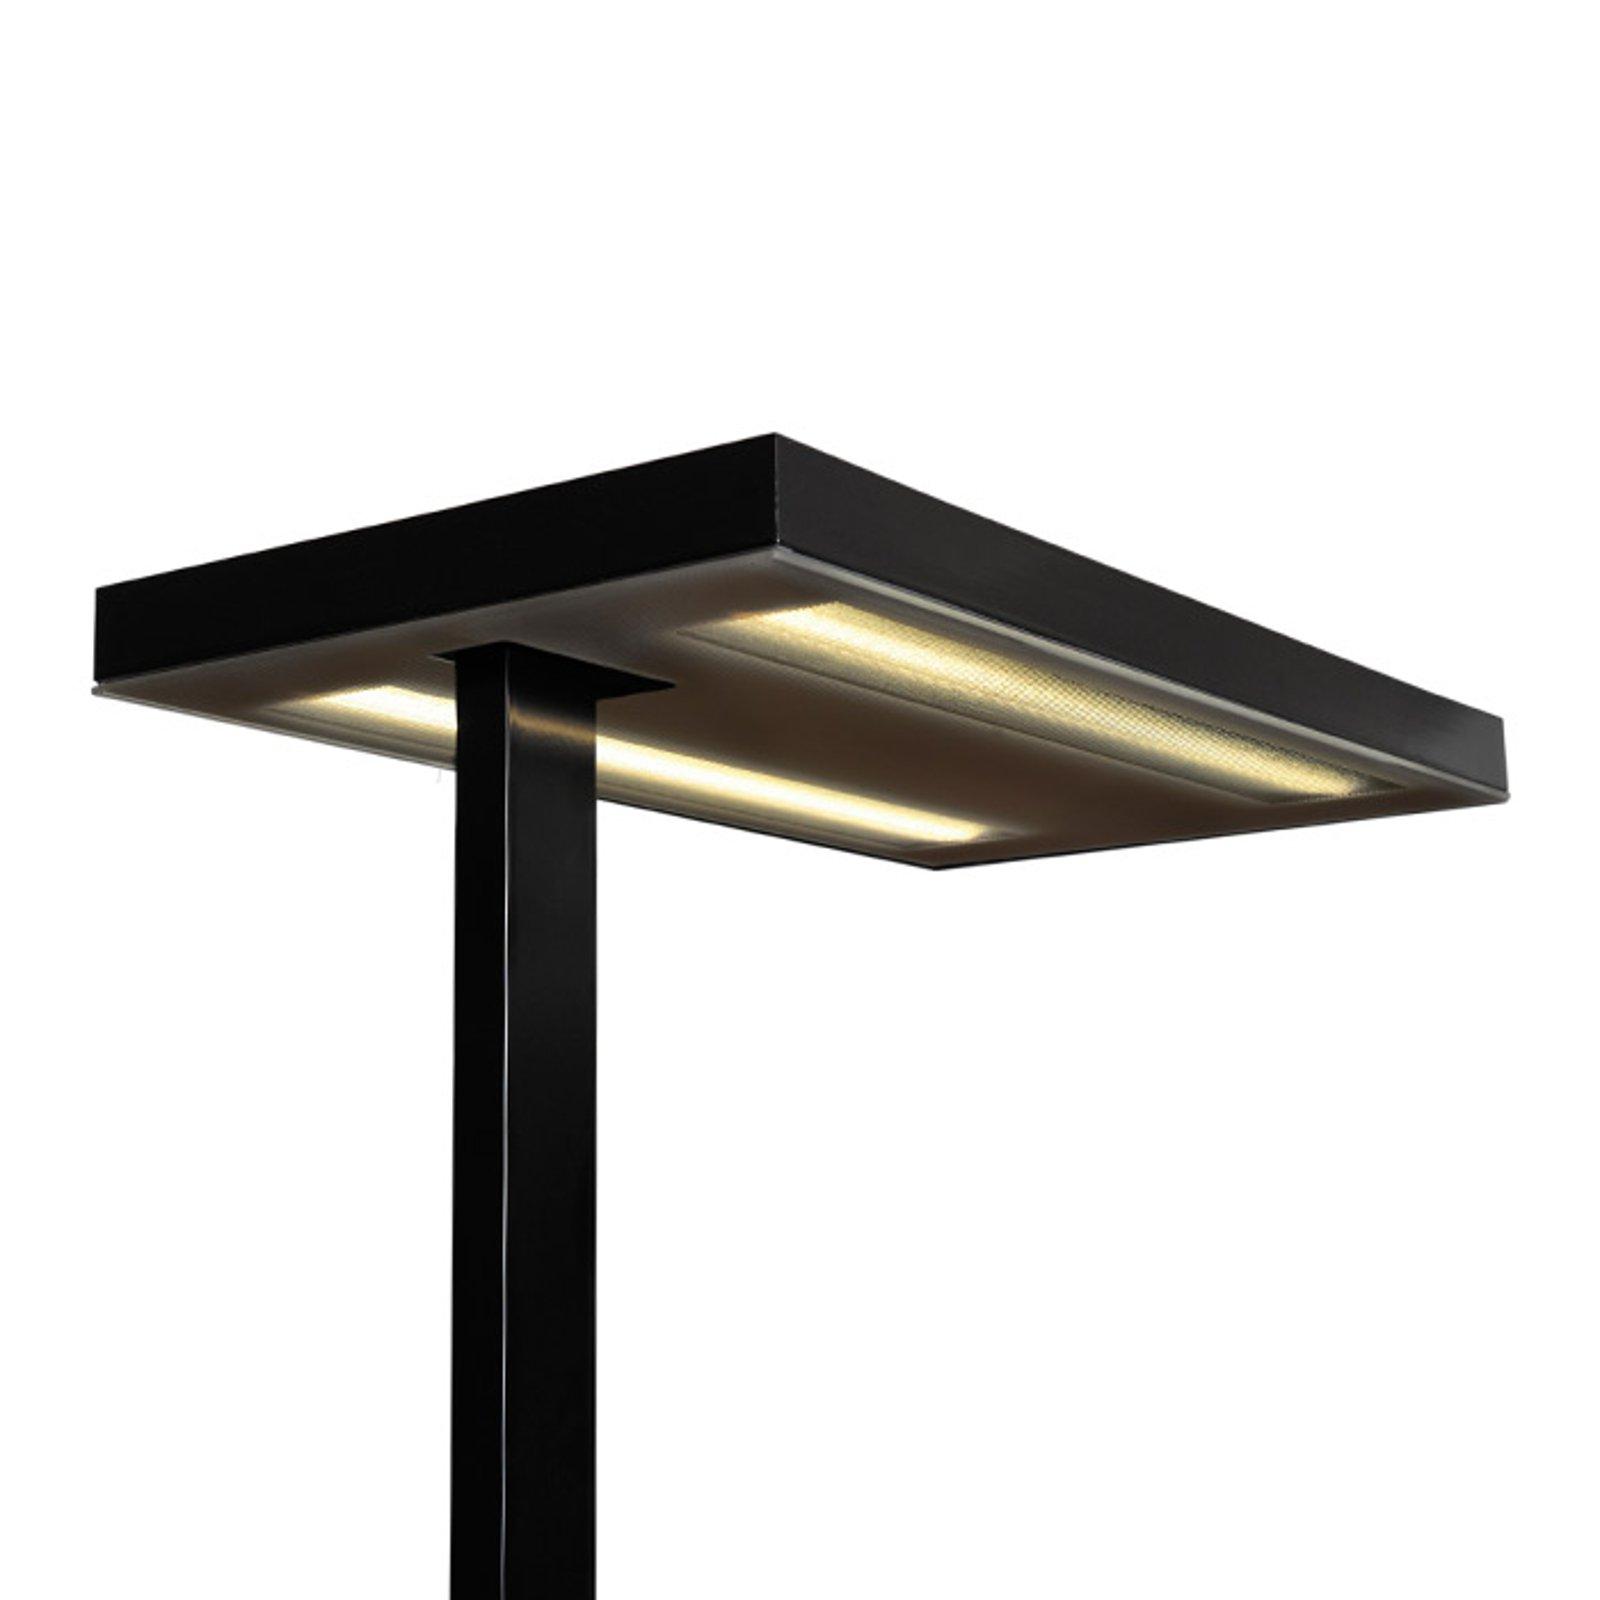 Gulvlampe Free-F LED10000 HFDd 840 SD svart